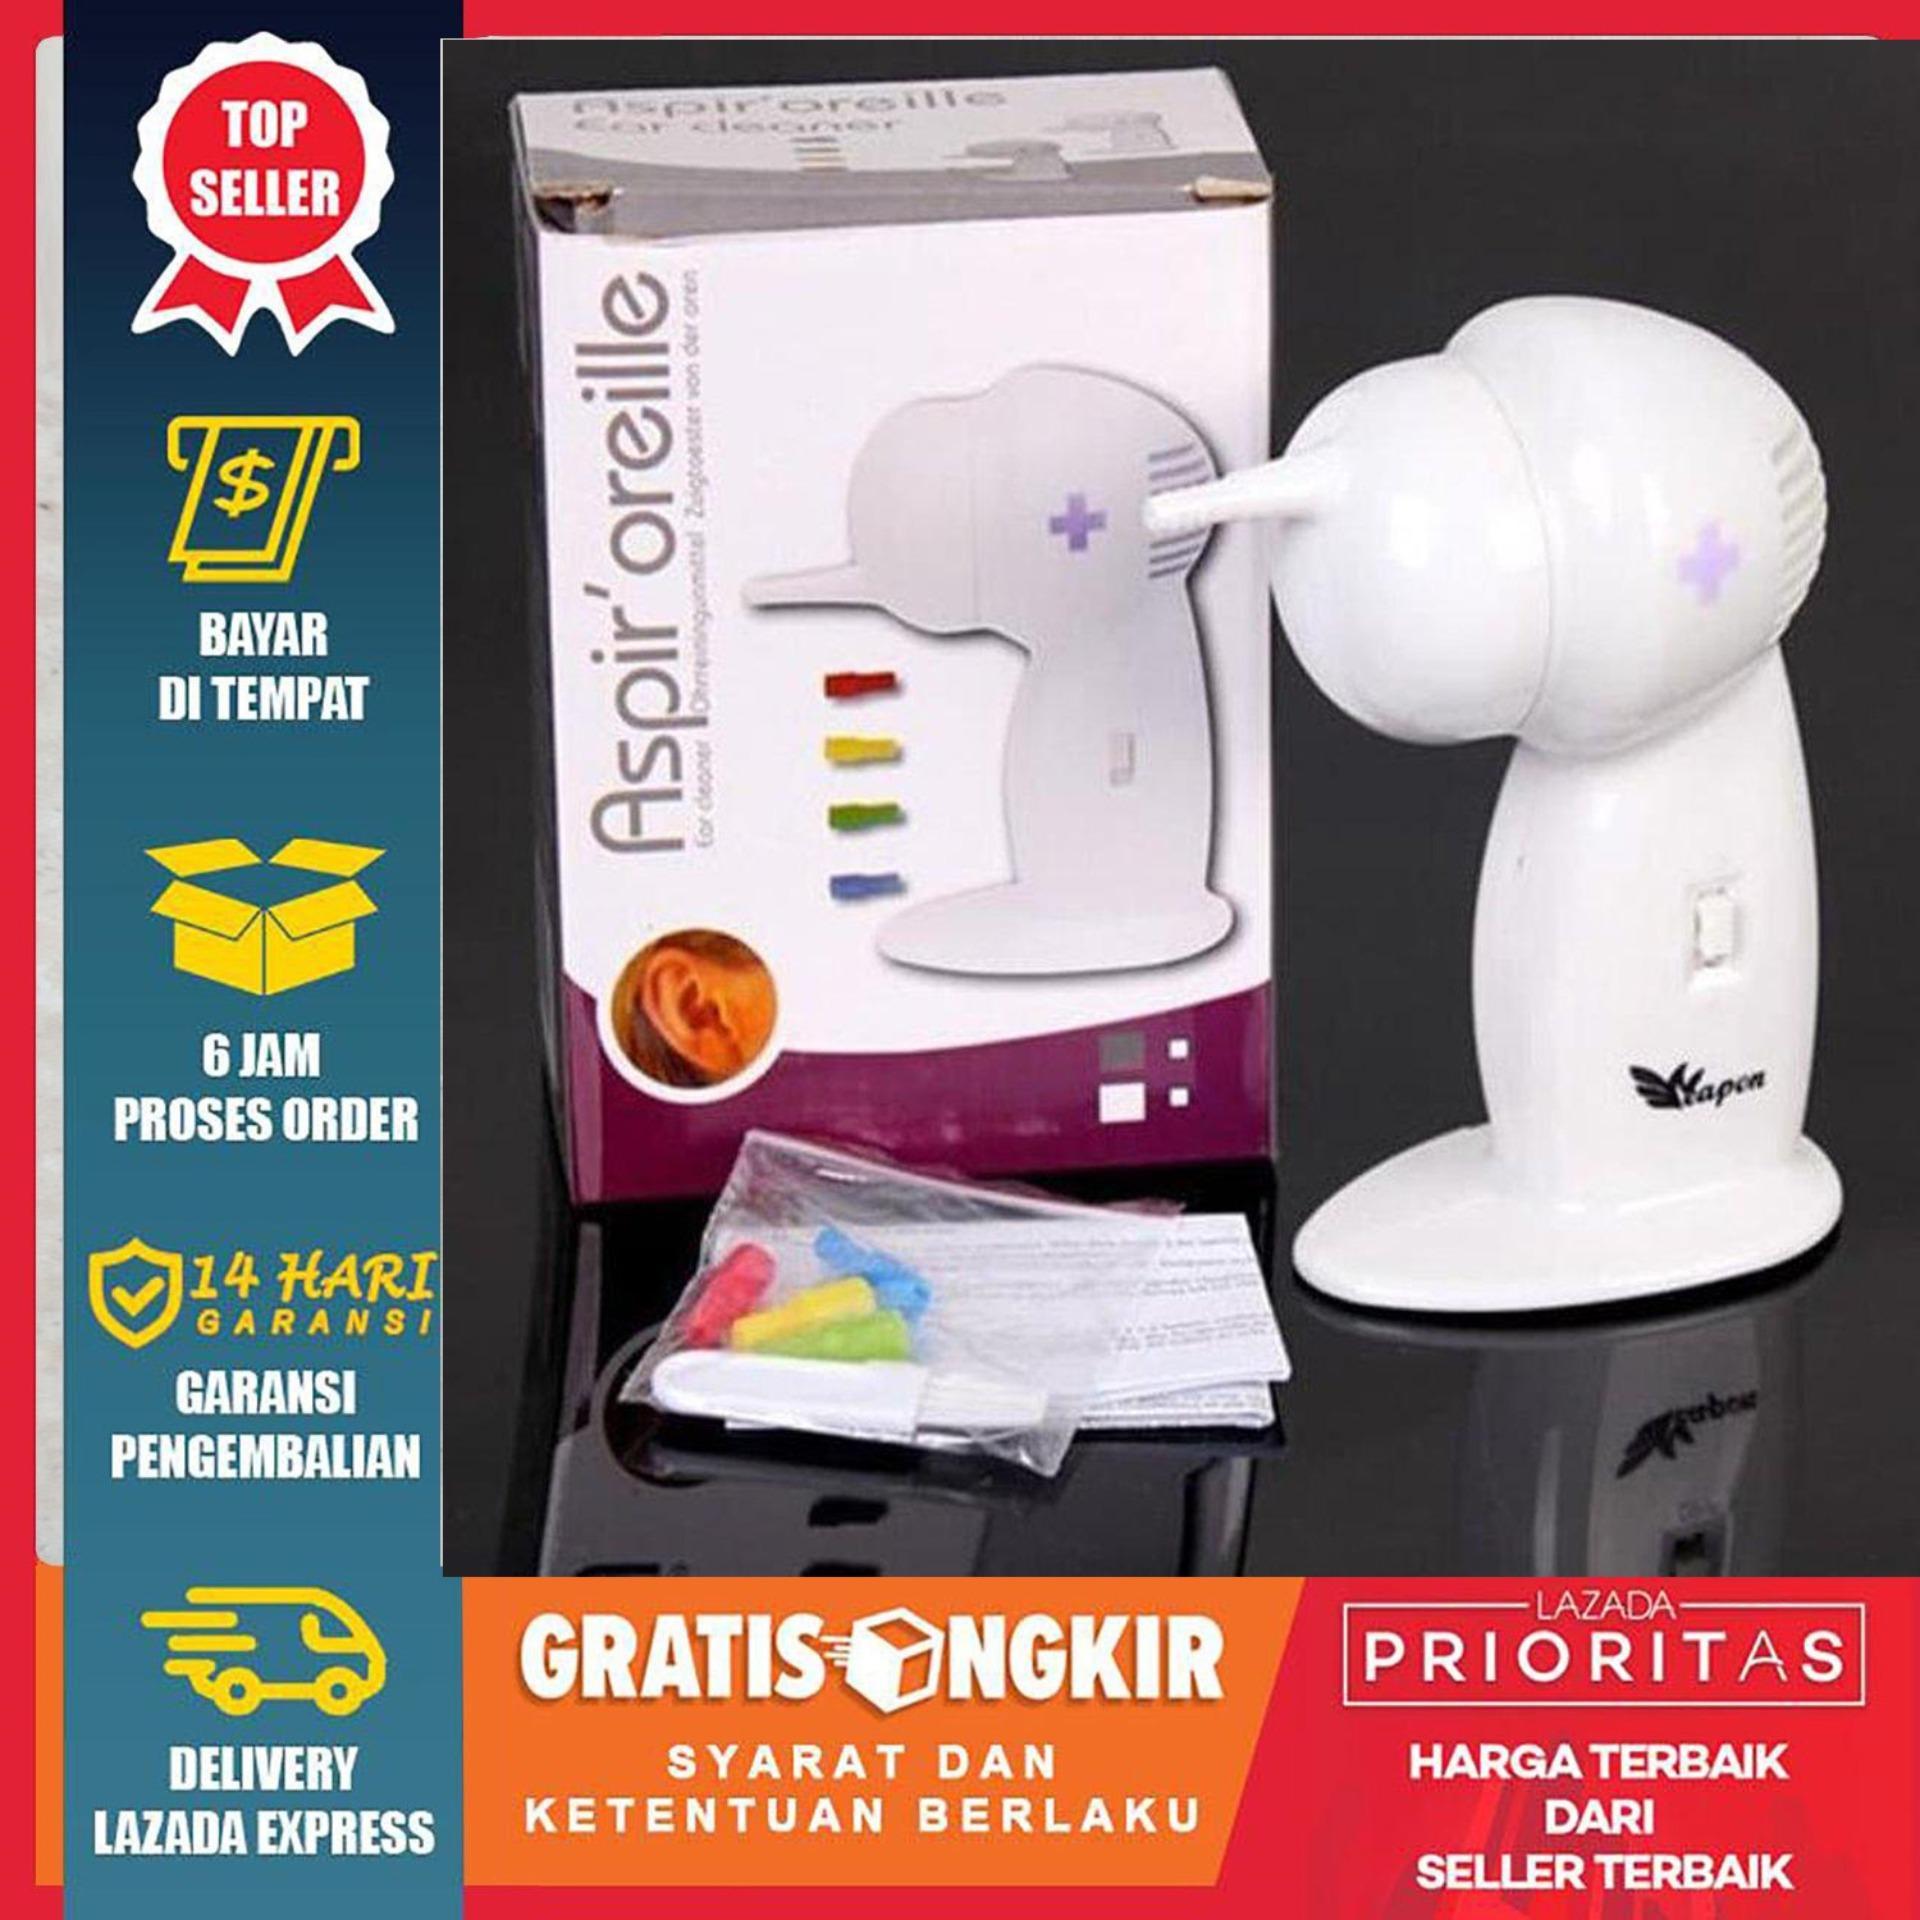 HIGH QUALITY - Premium ASPIR OREILLE PEMBERSIH TELINGA / Wax Vac Ear Cleaner Cleanser Gentle Suction